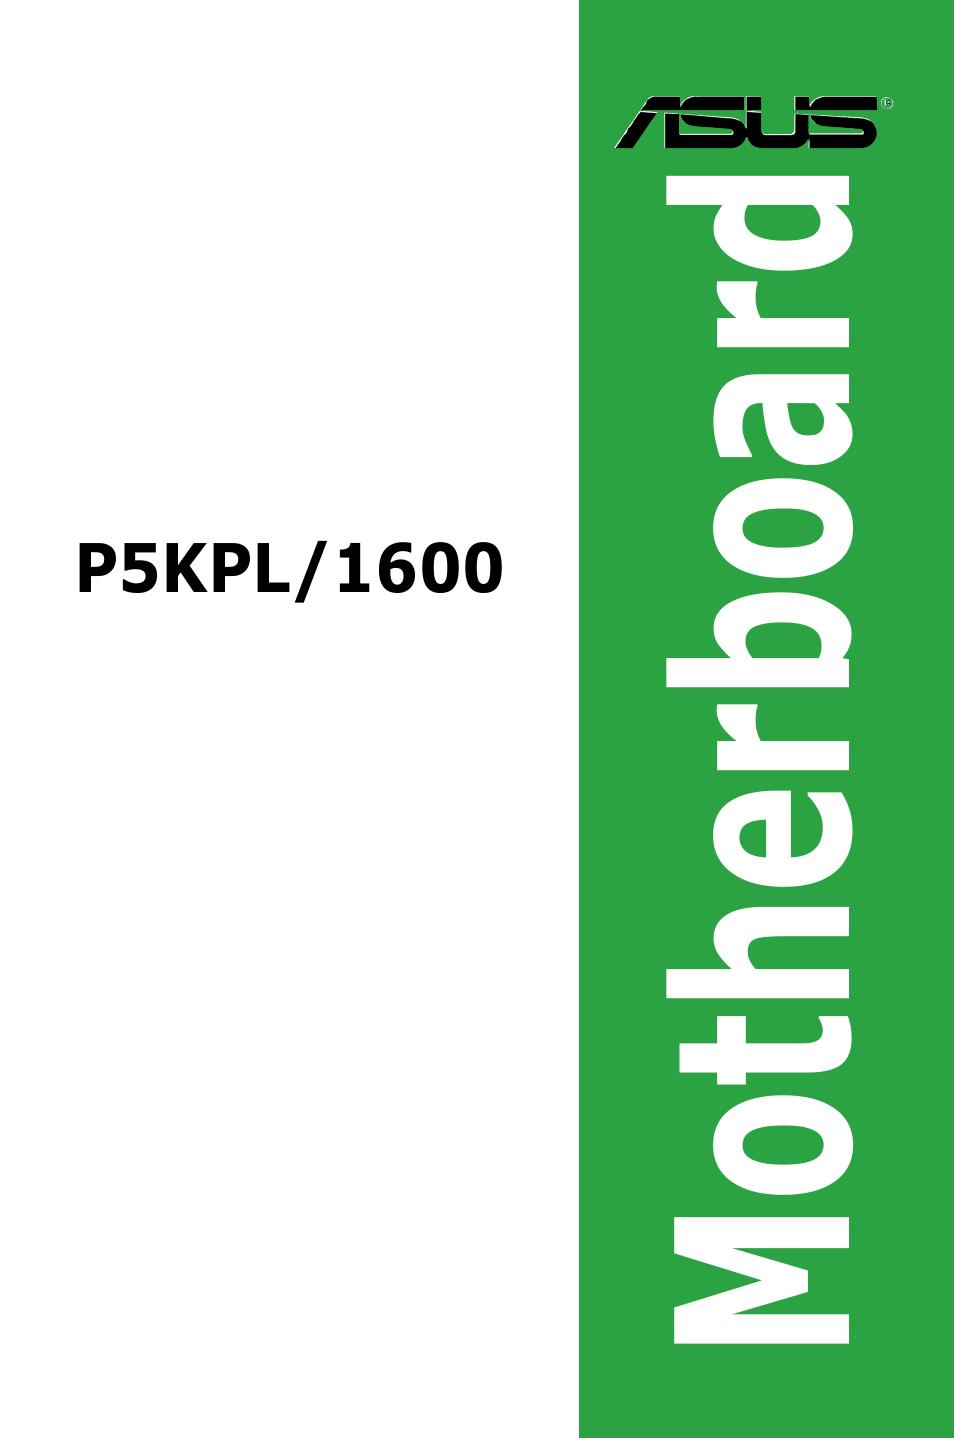 Asus p5kpl/1600 user's manual(english) page 45.